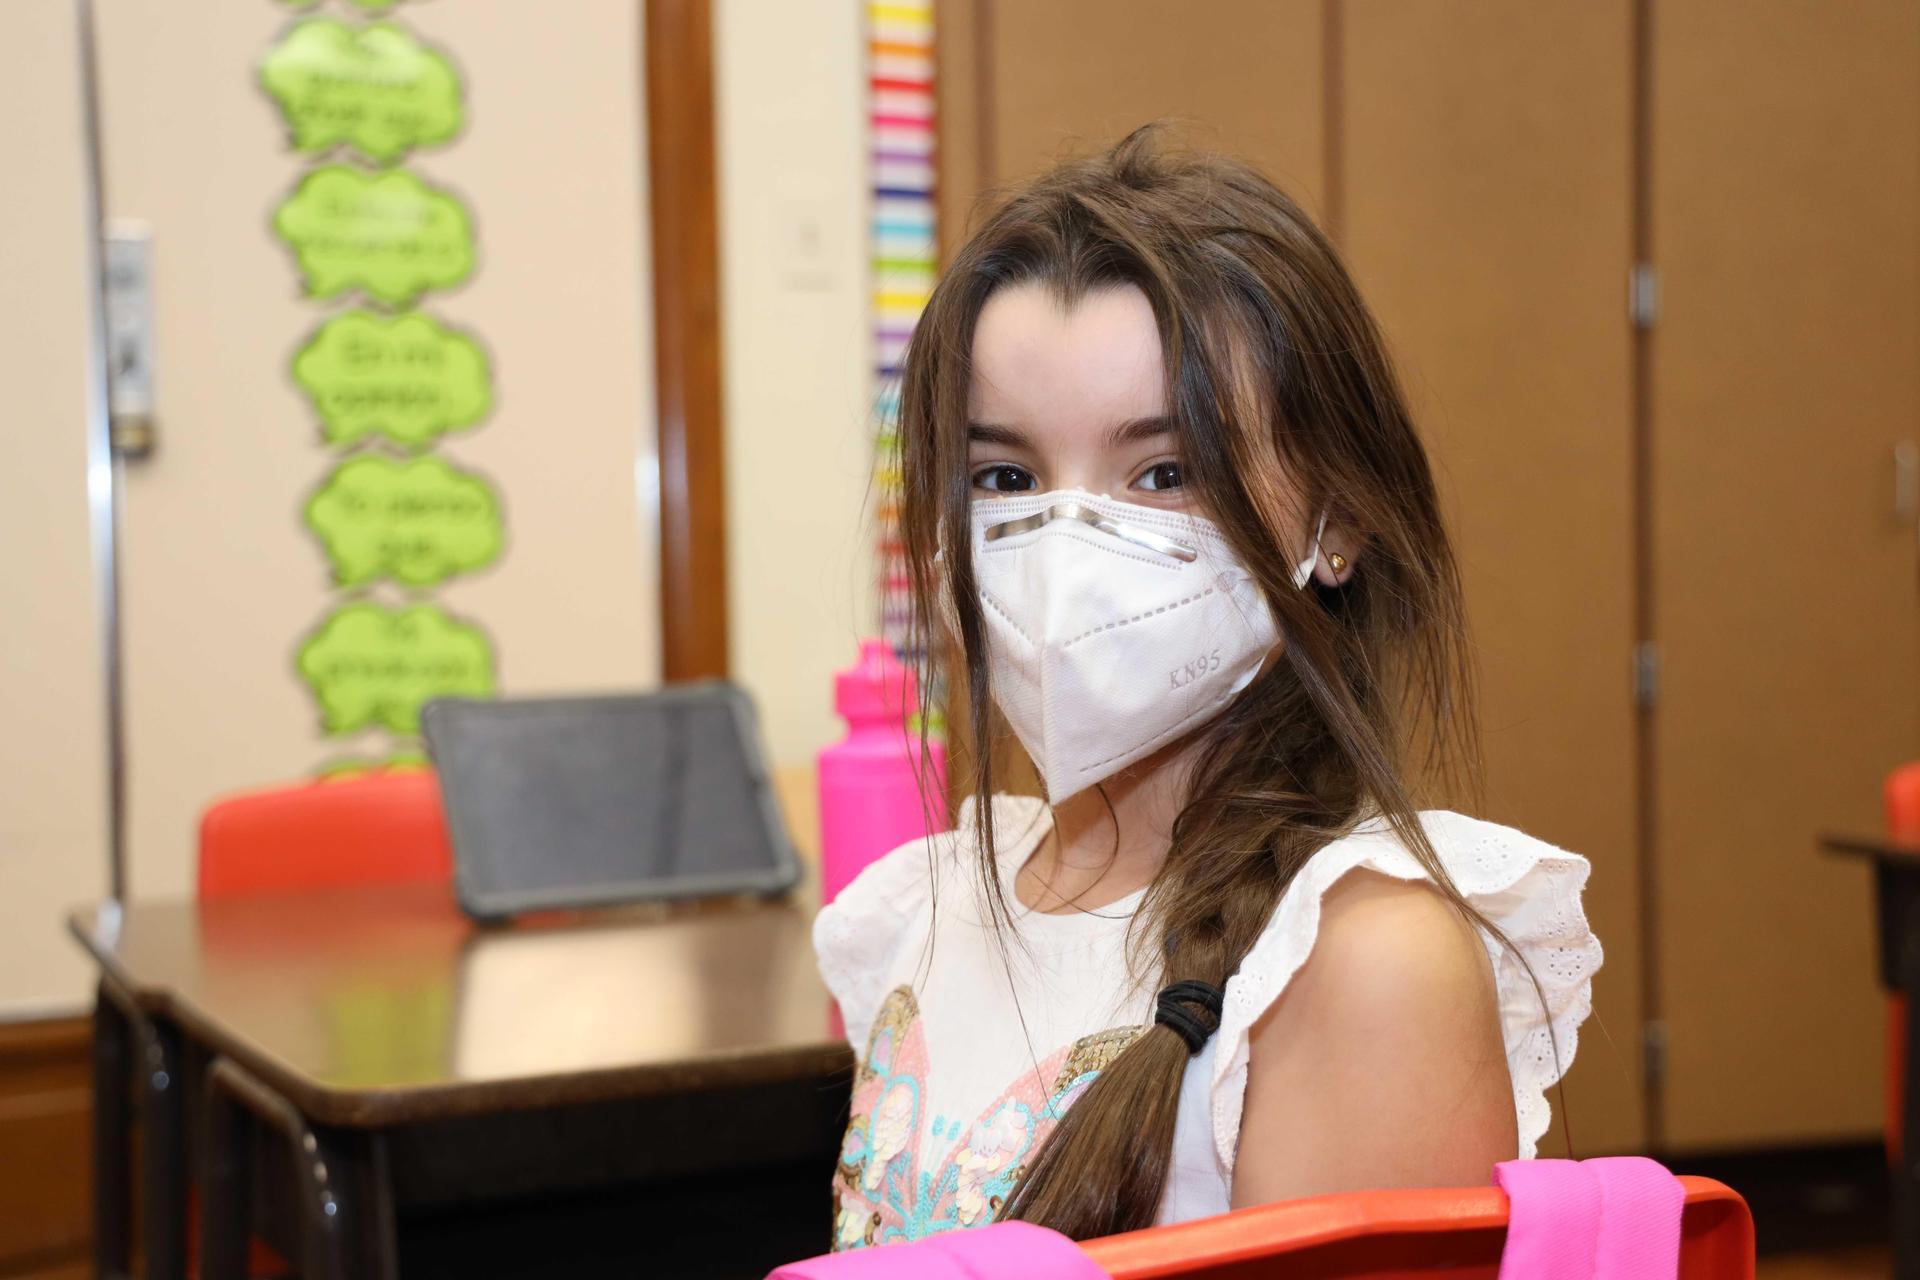 Deepwater Elementary students return to school